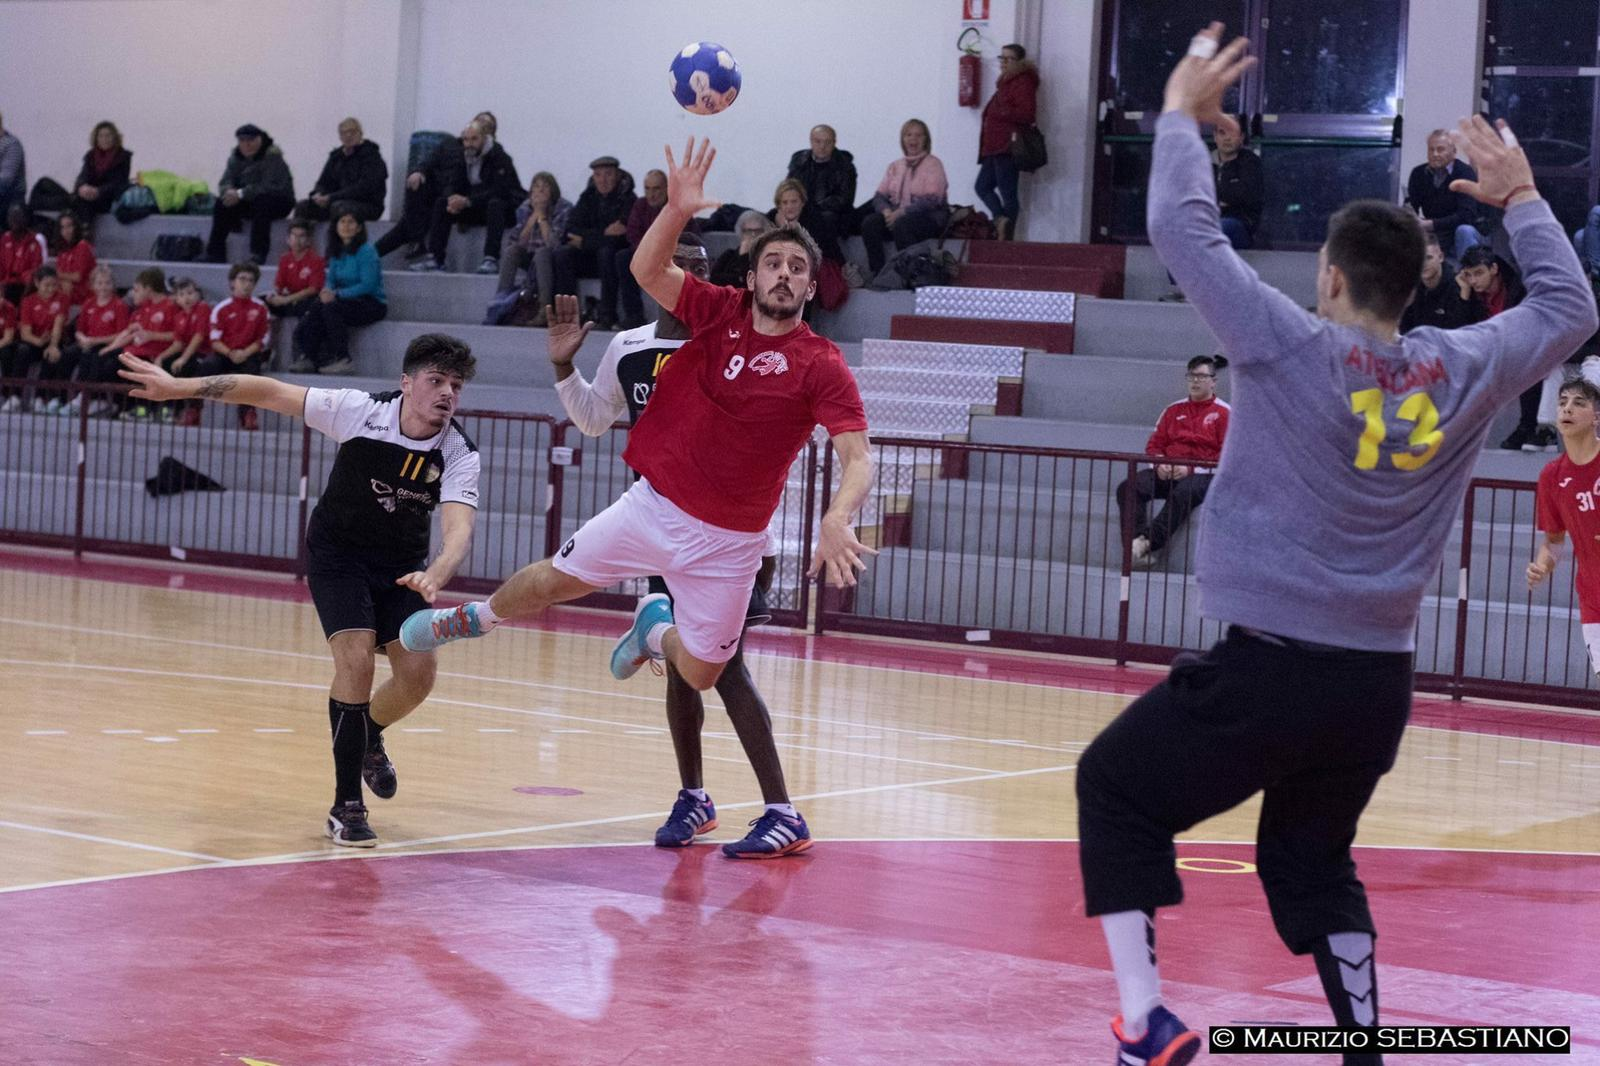 La Lions Teramo sfida la capolista CUS Palermo